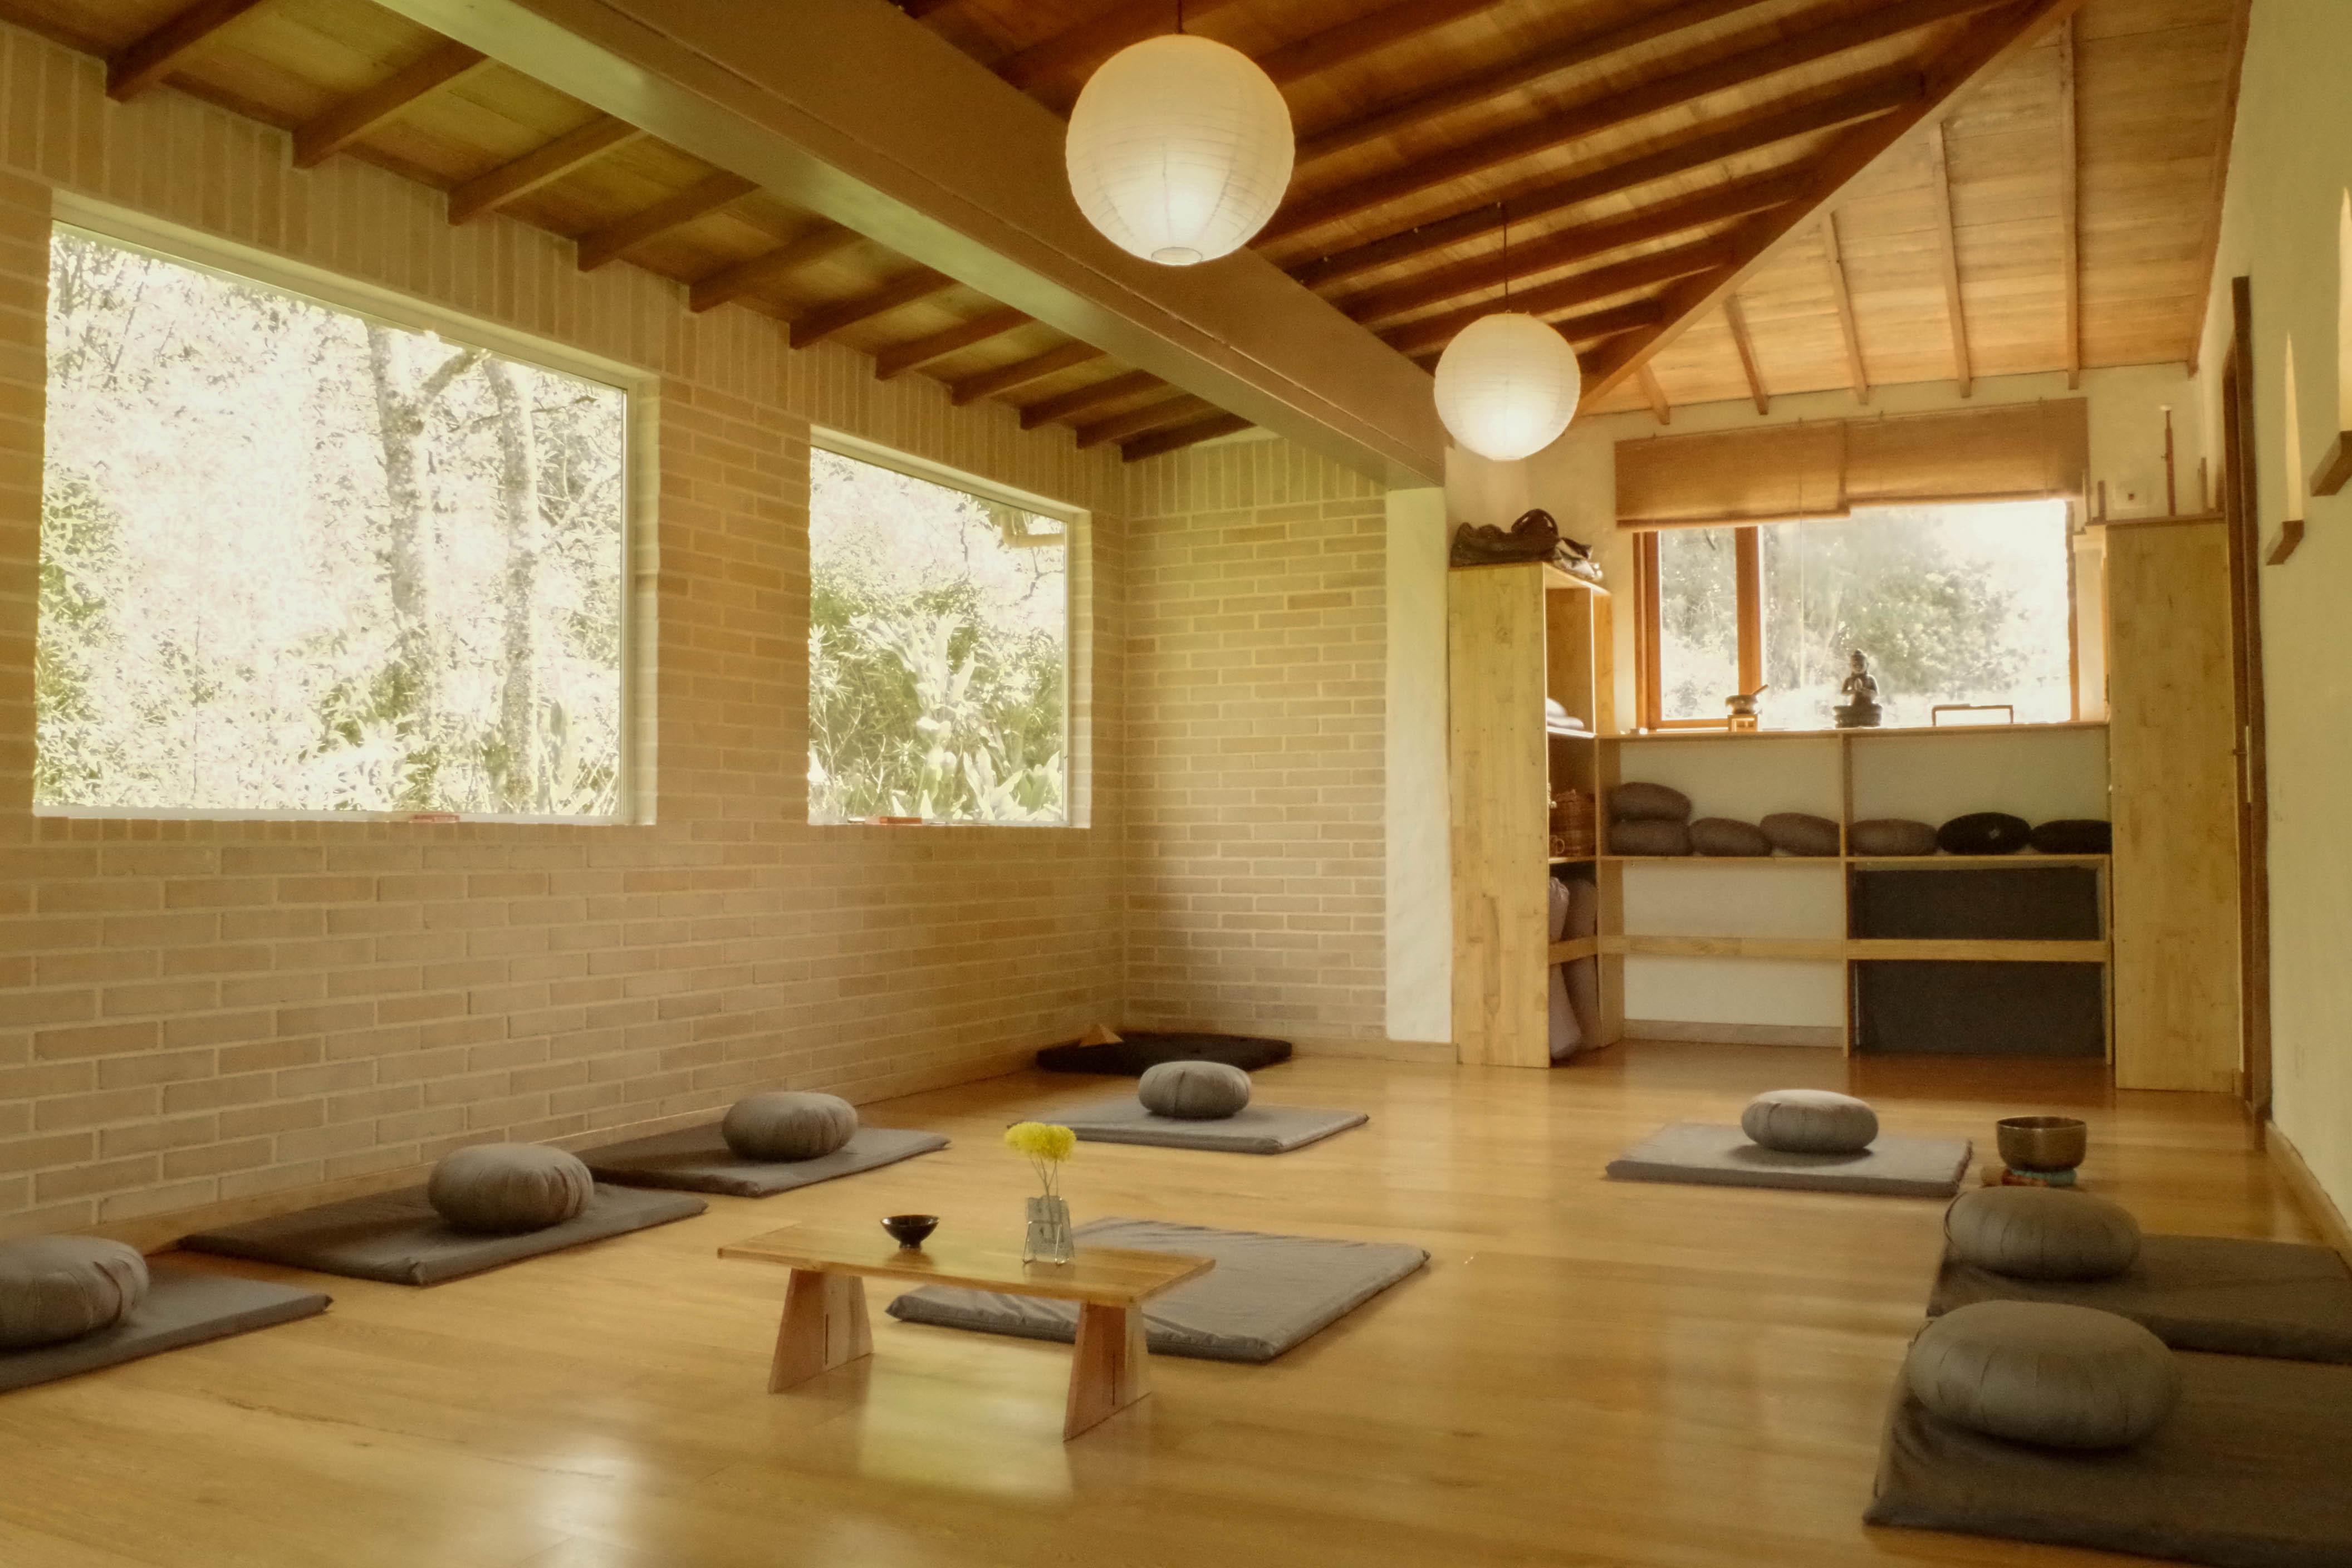 10 tips para meditar - Un lugar para meditar ...